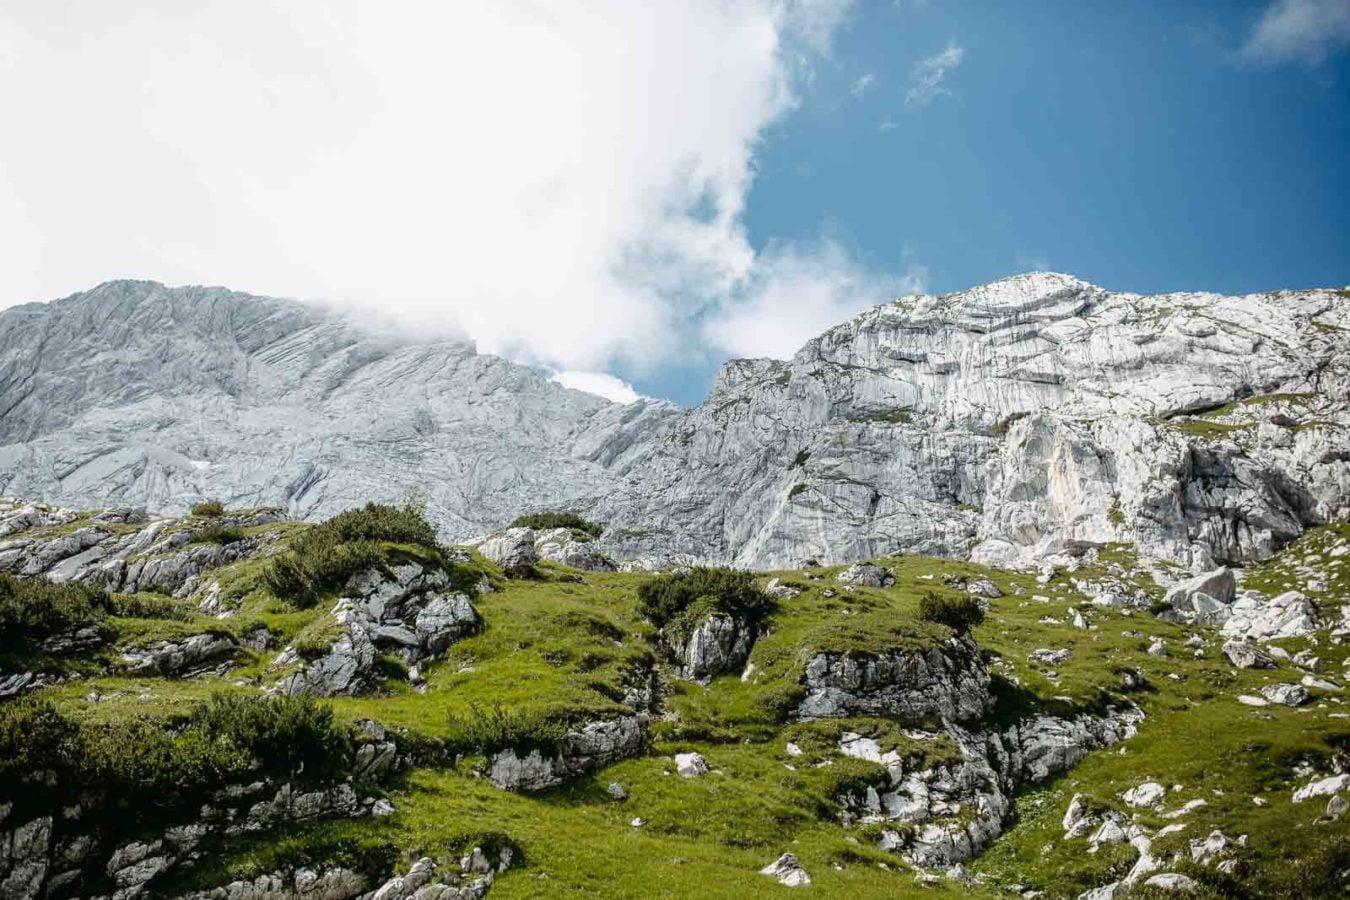 Babybauchshooting Alpspitze 10